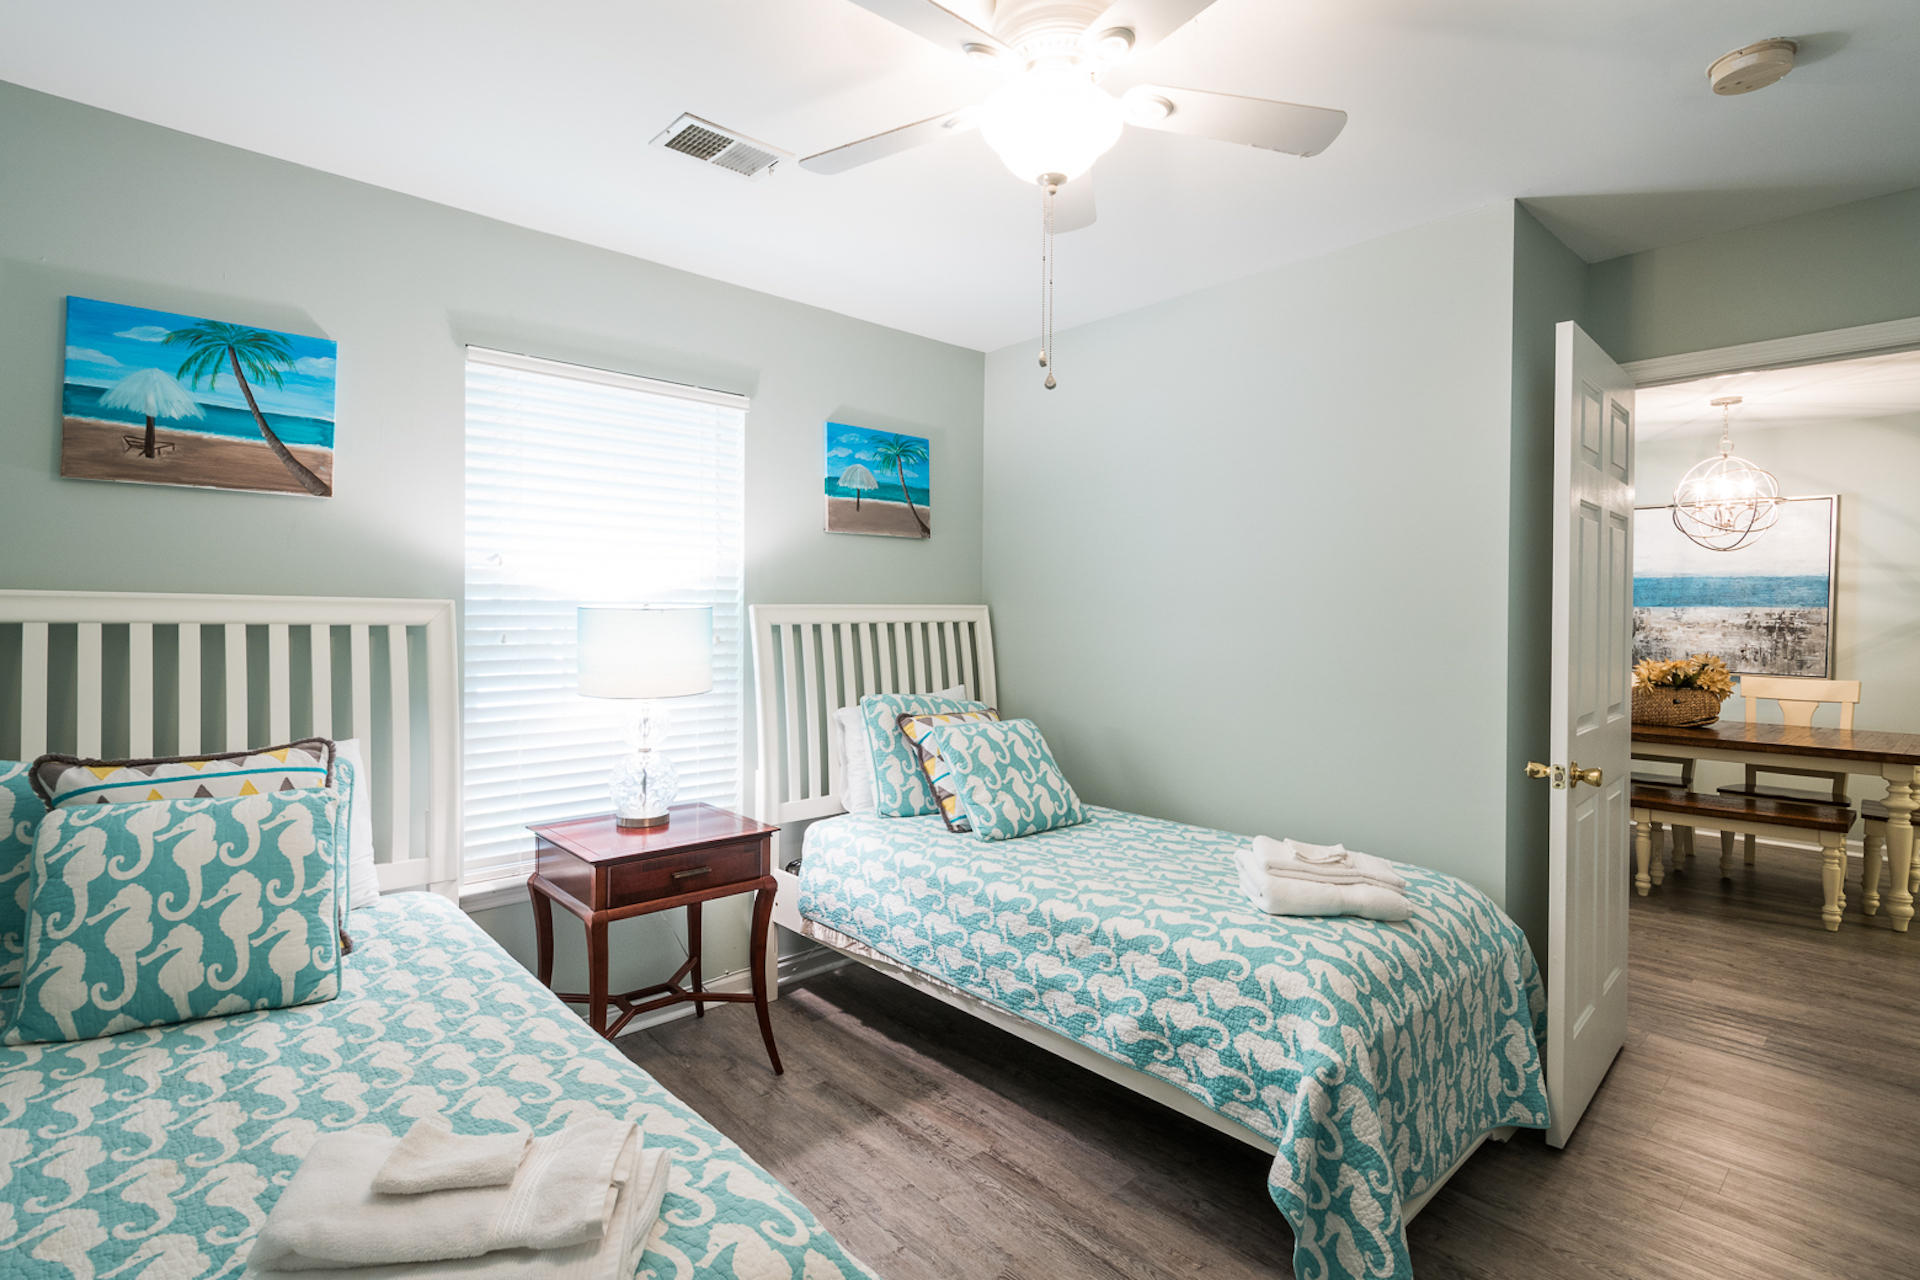 Meridian Place Homes For Sale - 1420 Amanda Park, Charleston, SC - 11